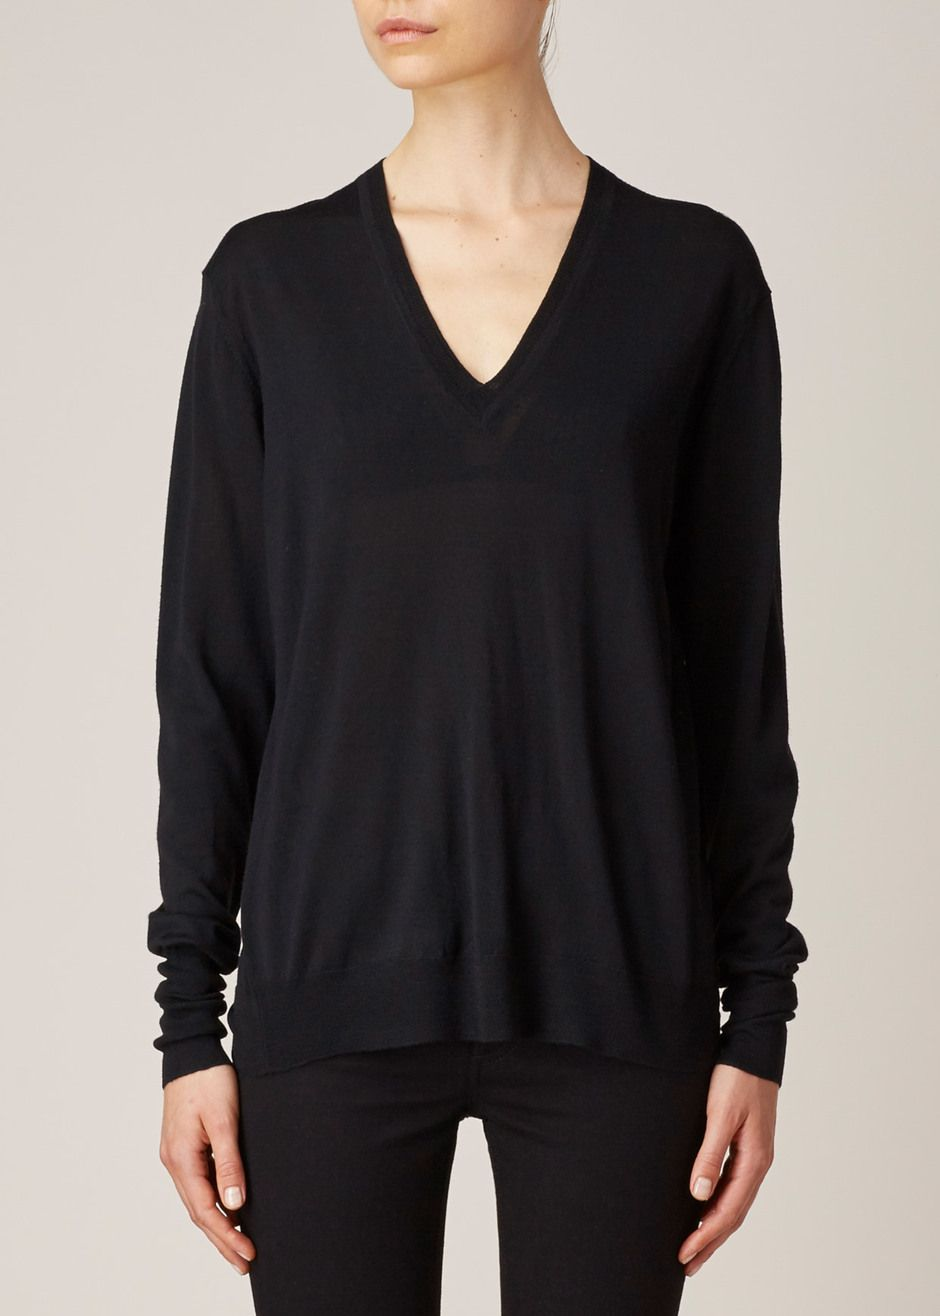 lightweight V-neck sweater - Black 6397 Cheapest Sale Online Sale Websites mdMLr